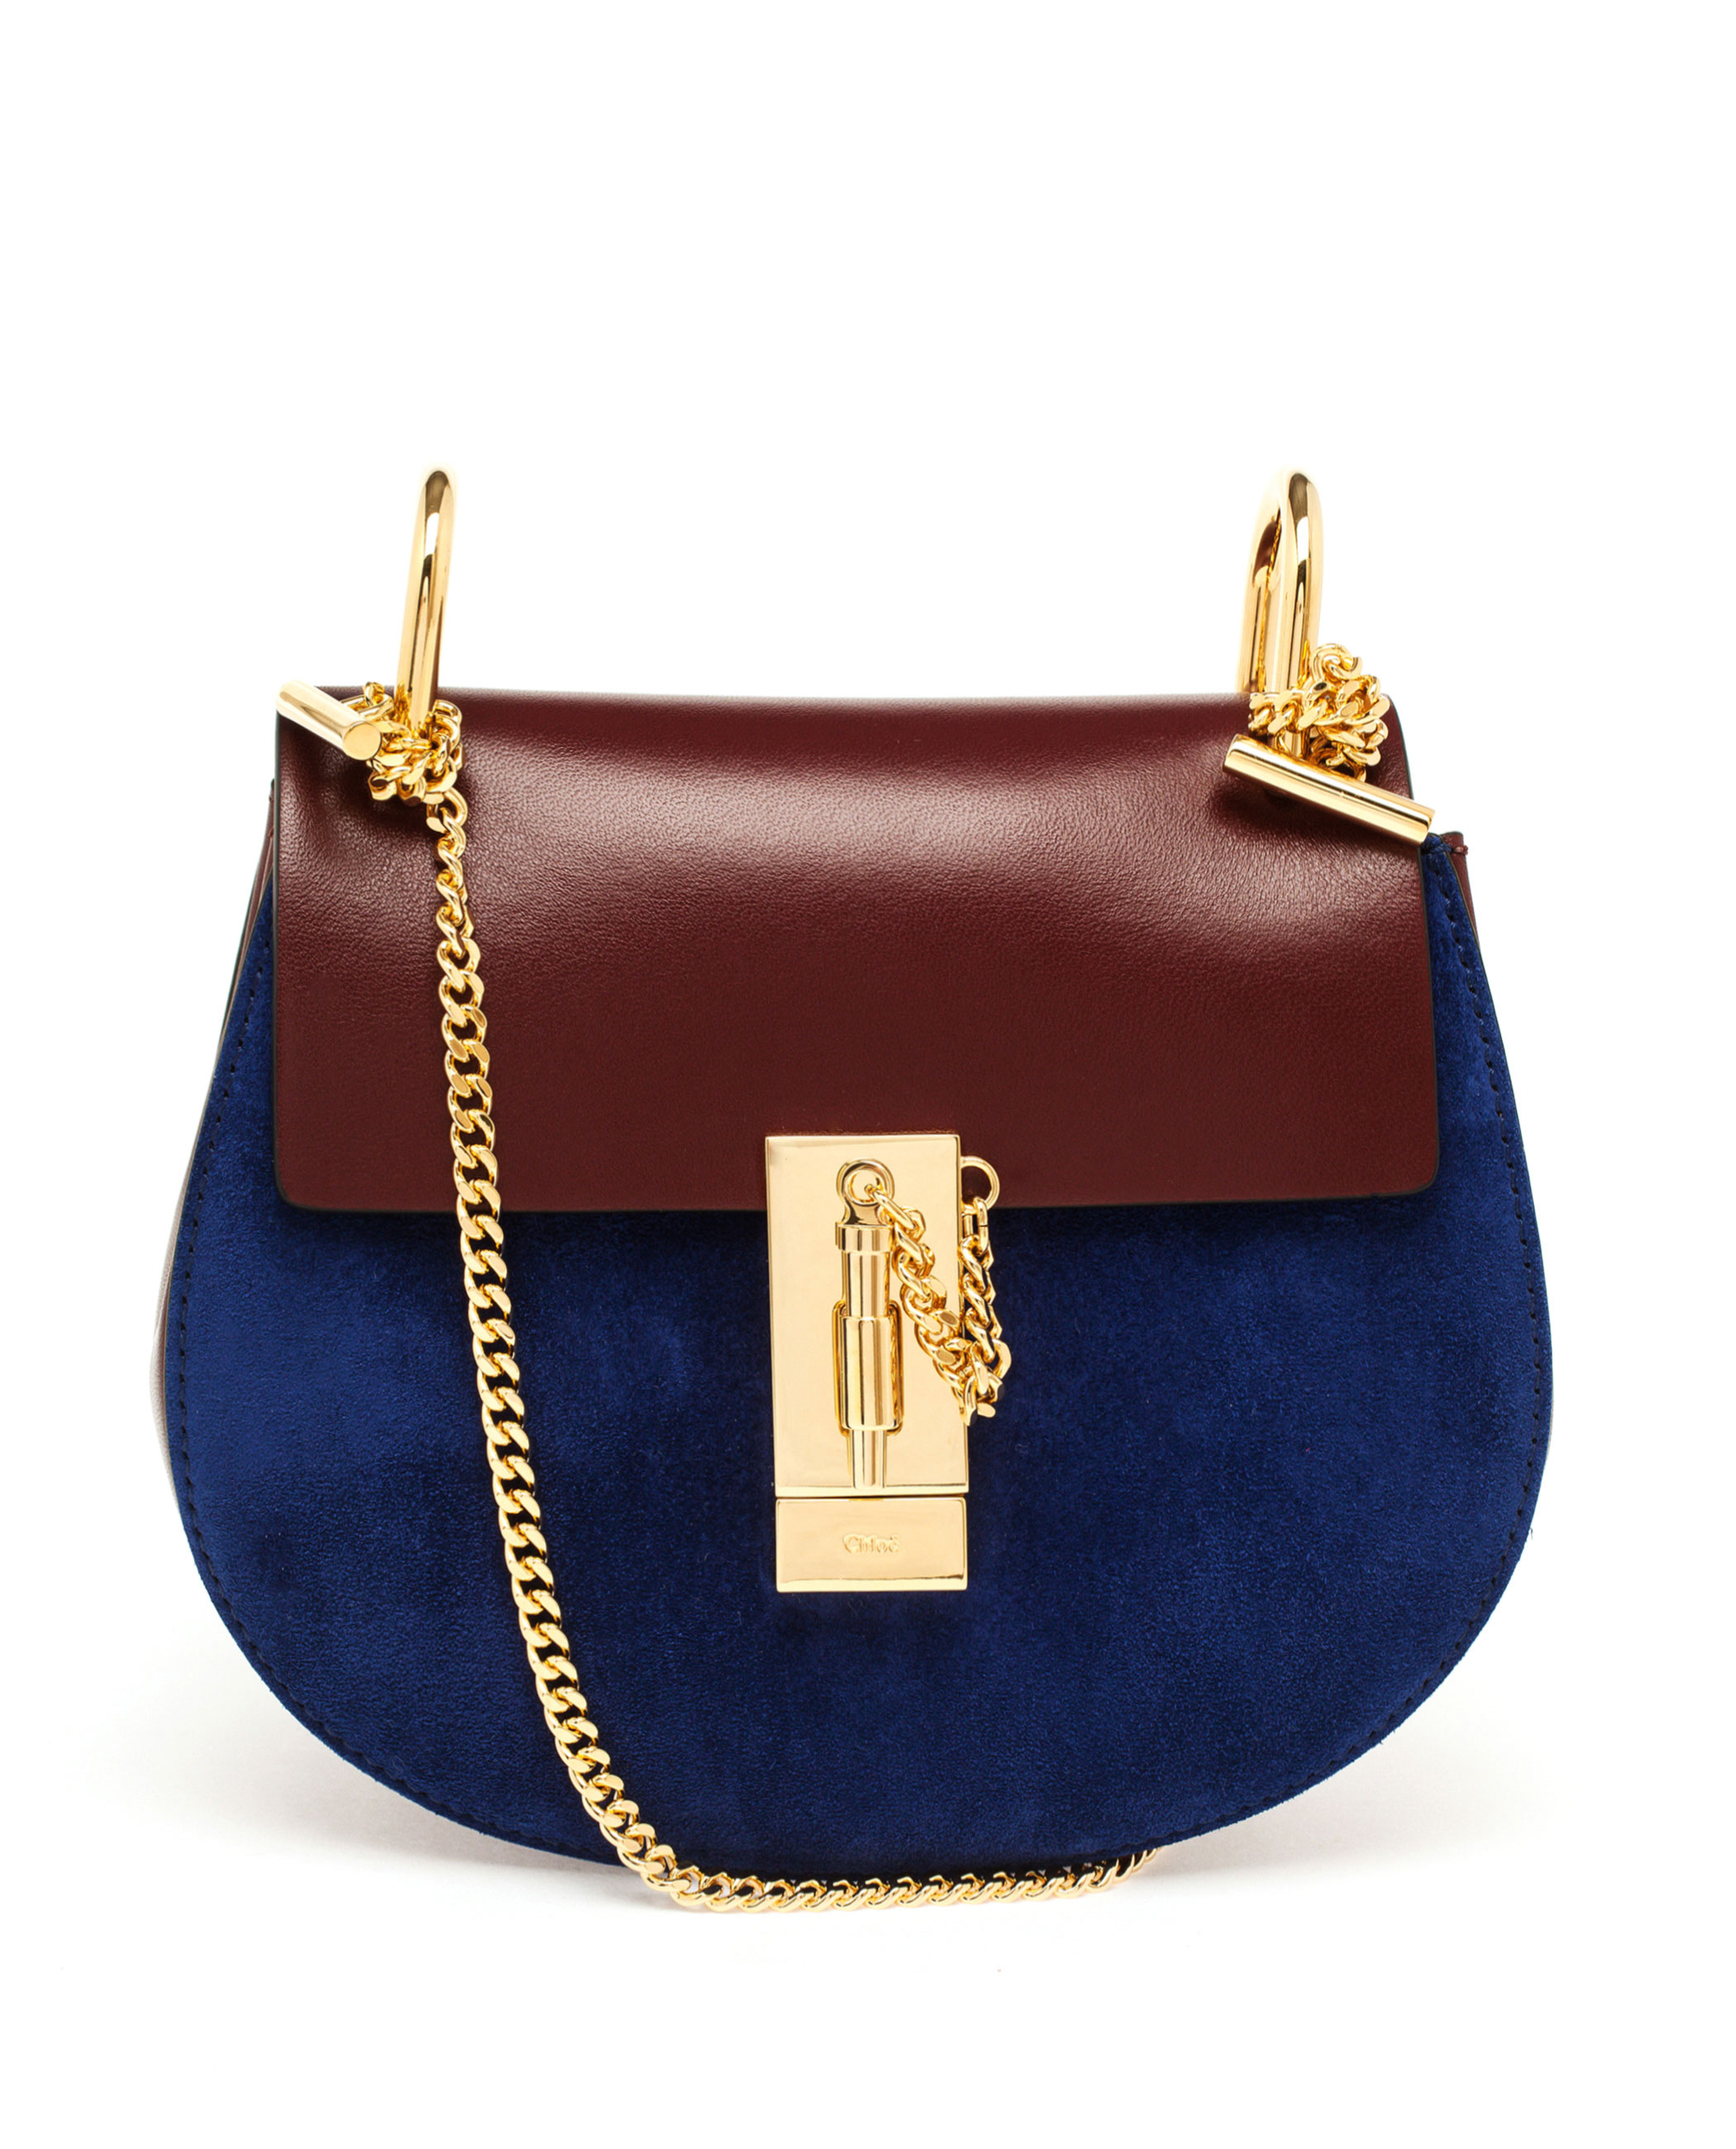 chloe elsie shoulder bag - Chlo�� Small Bi-Colour Drew Bag in Blue (NAVY MULTI) | Lyst